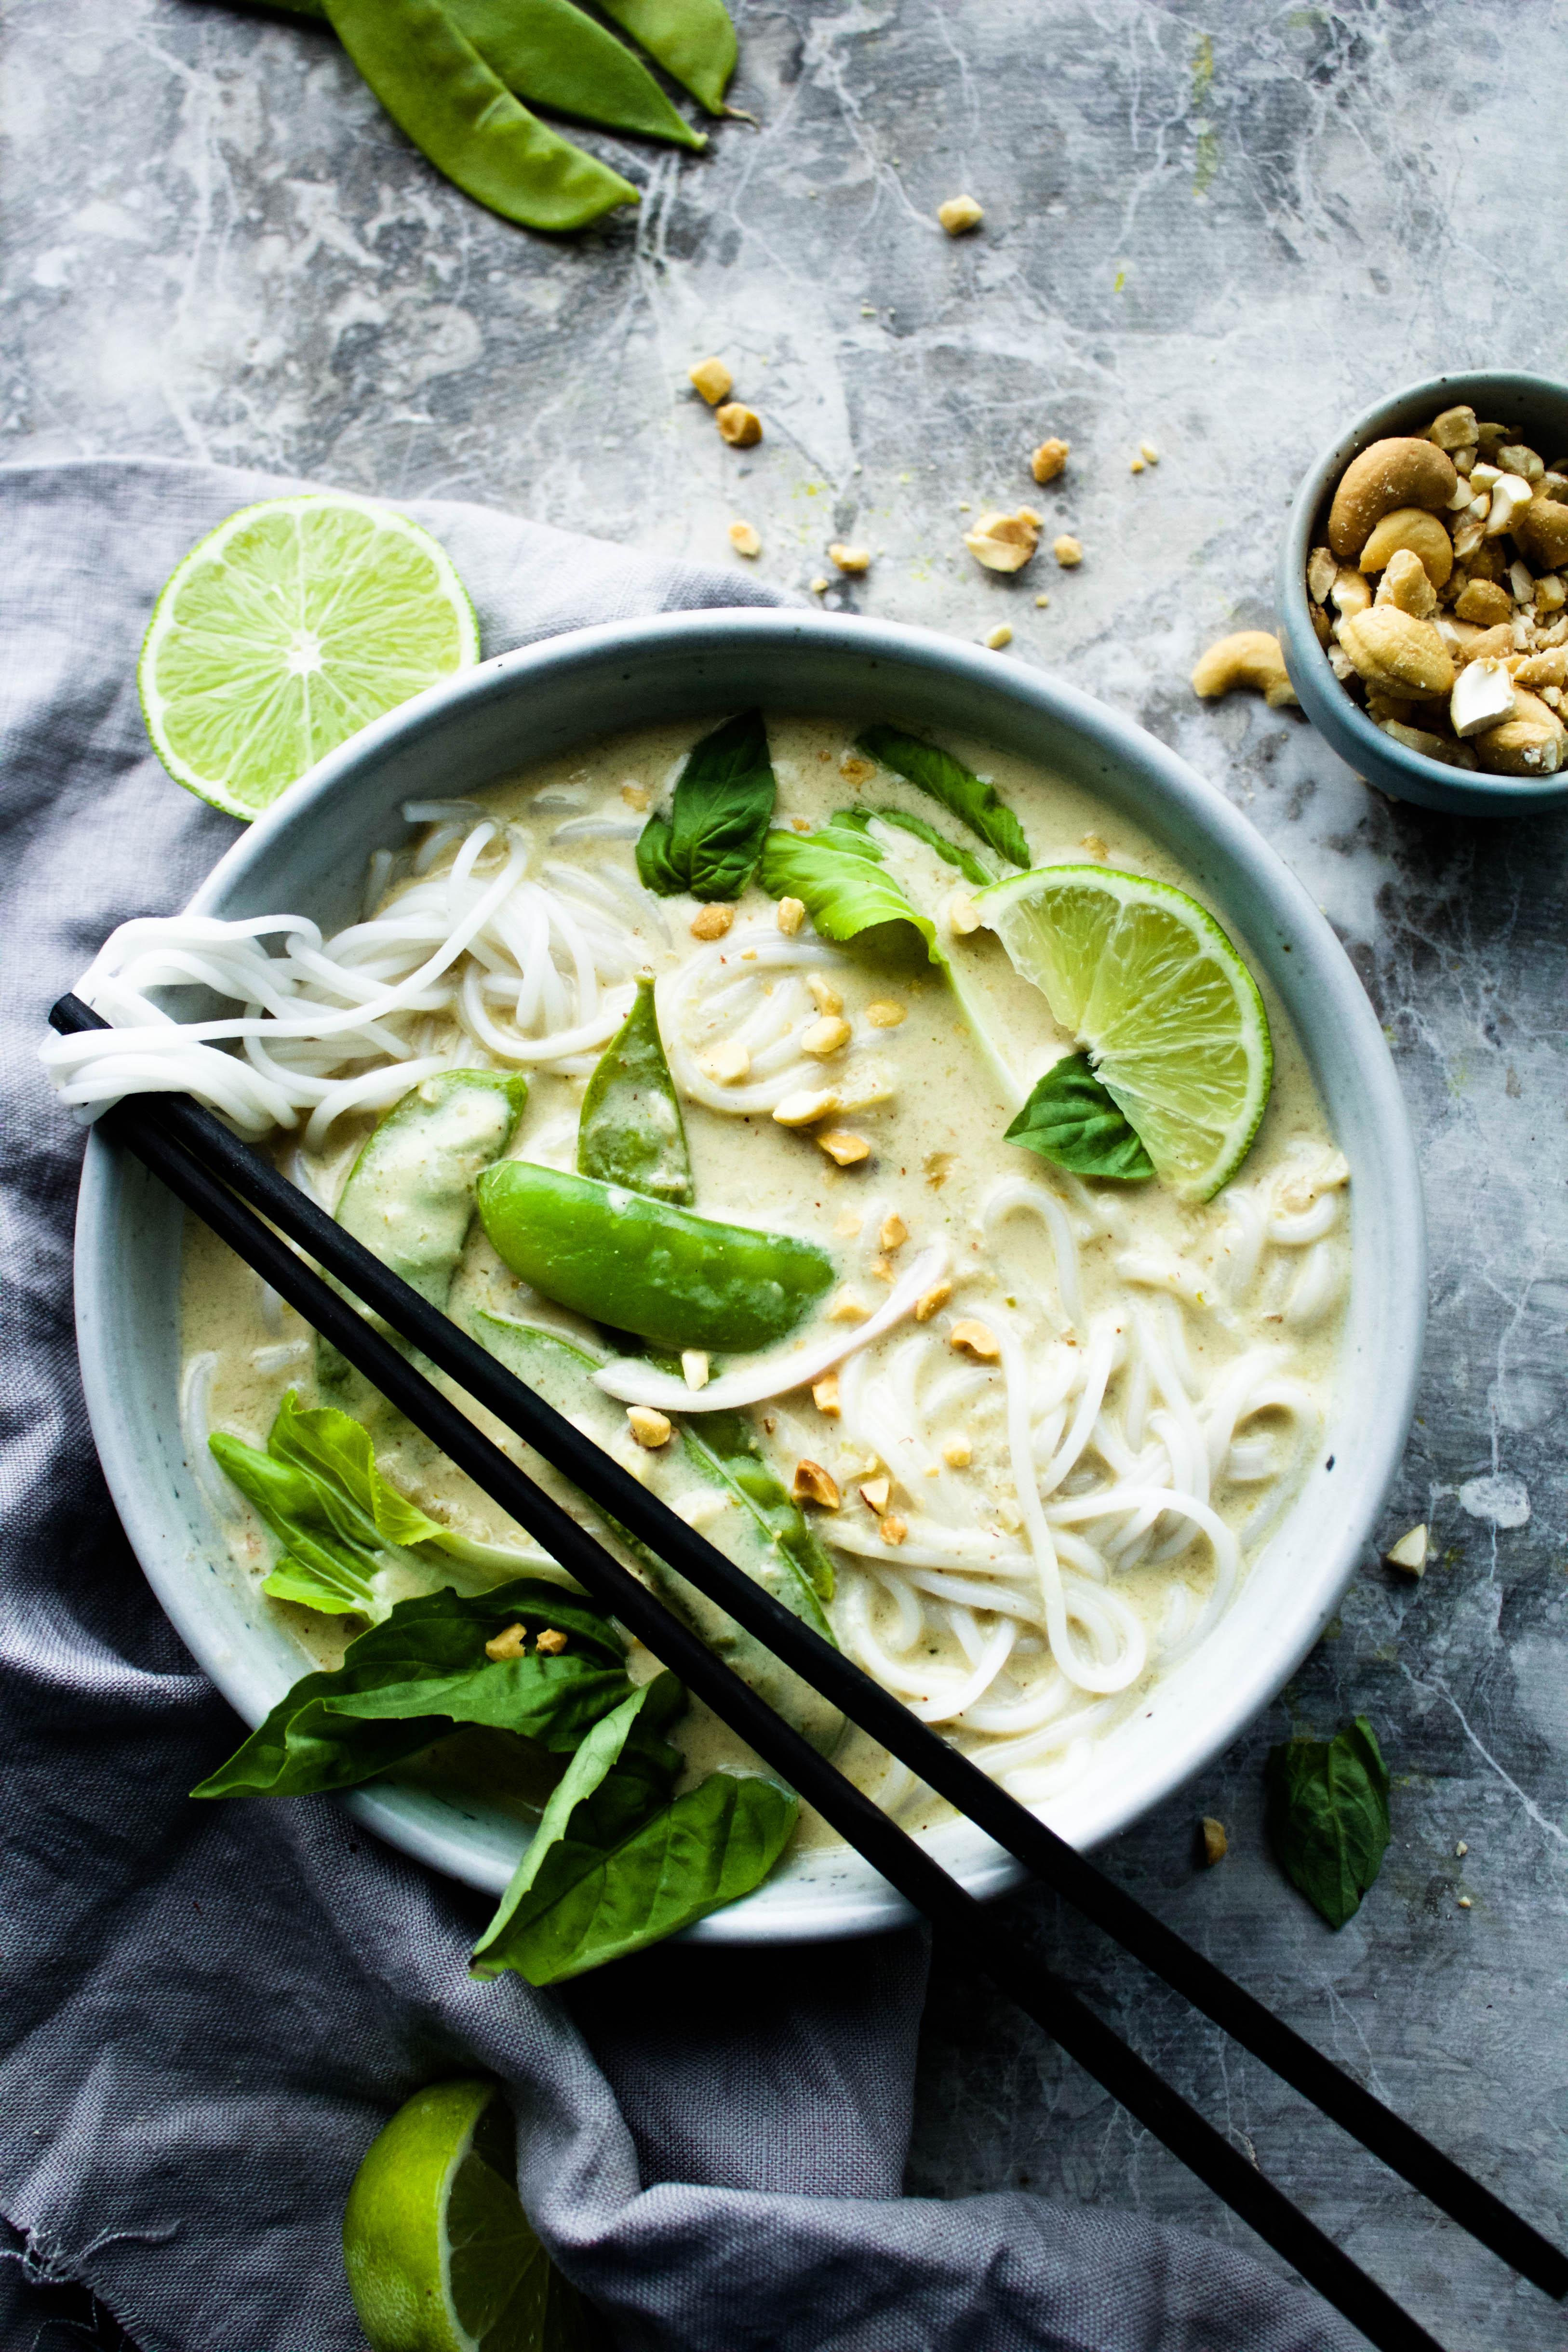 The Creamiest Vegan Thai Green Curry